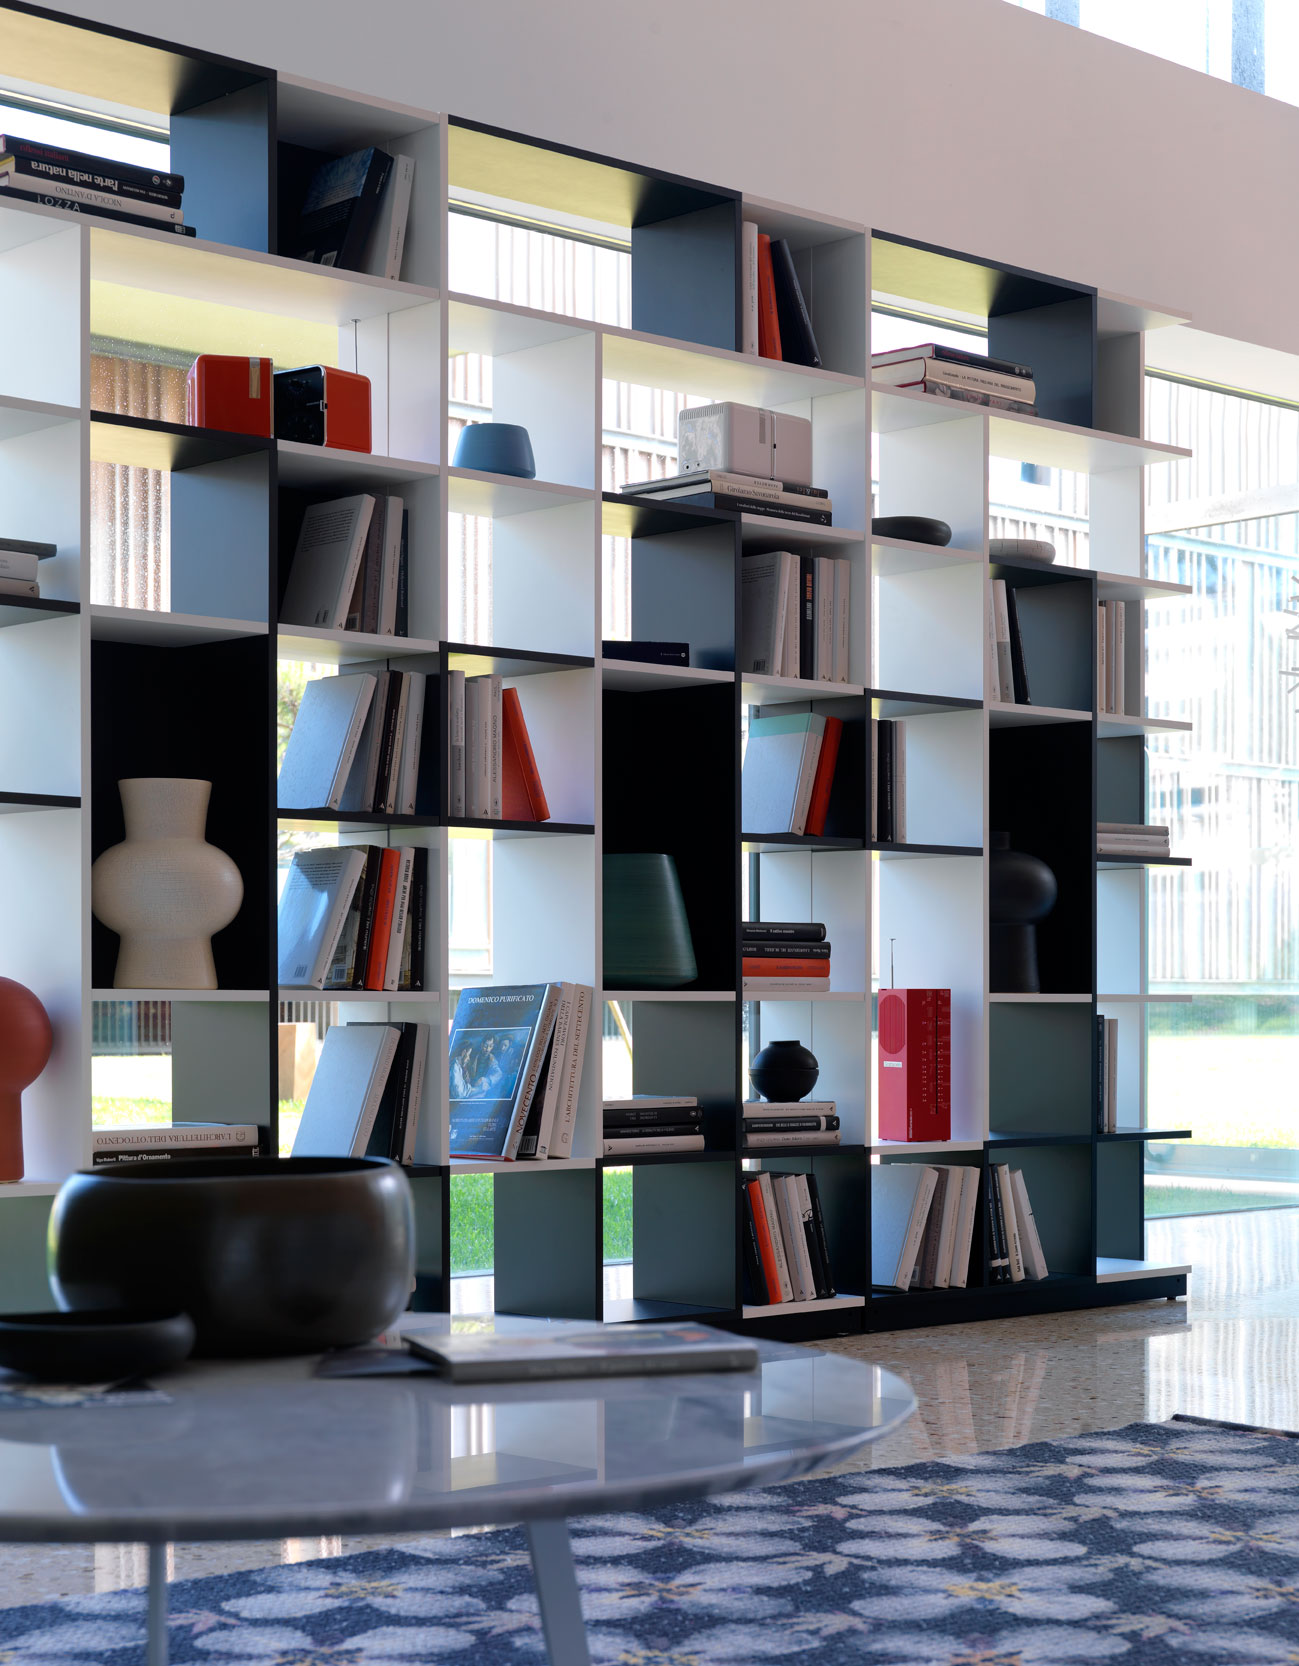 Foto Biblioteca Mdf Alb Negru Plus